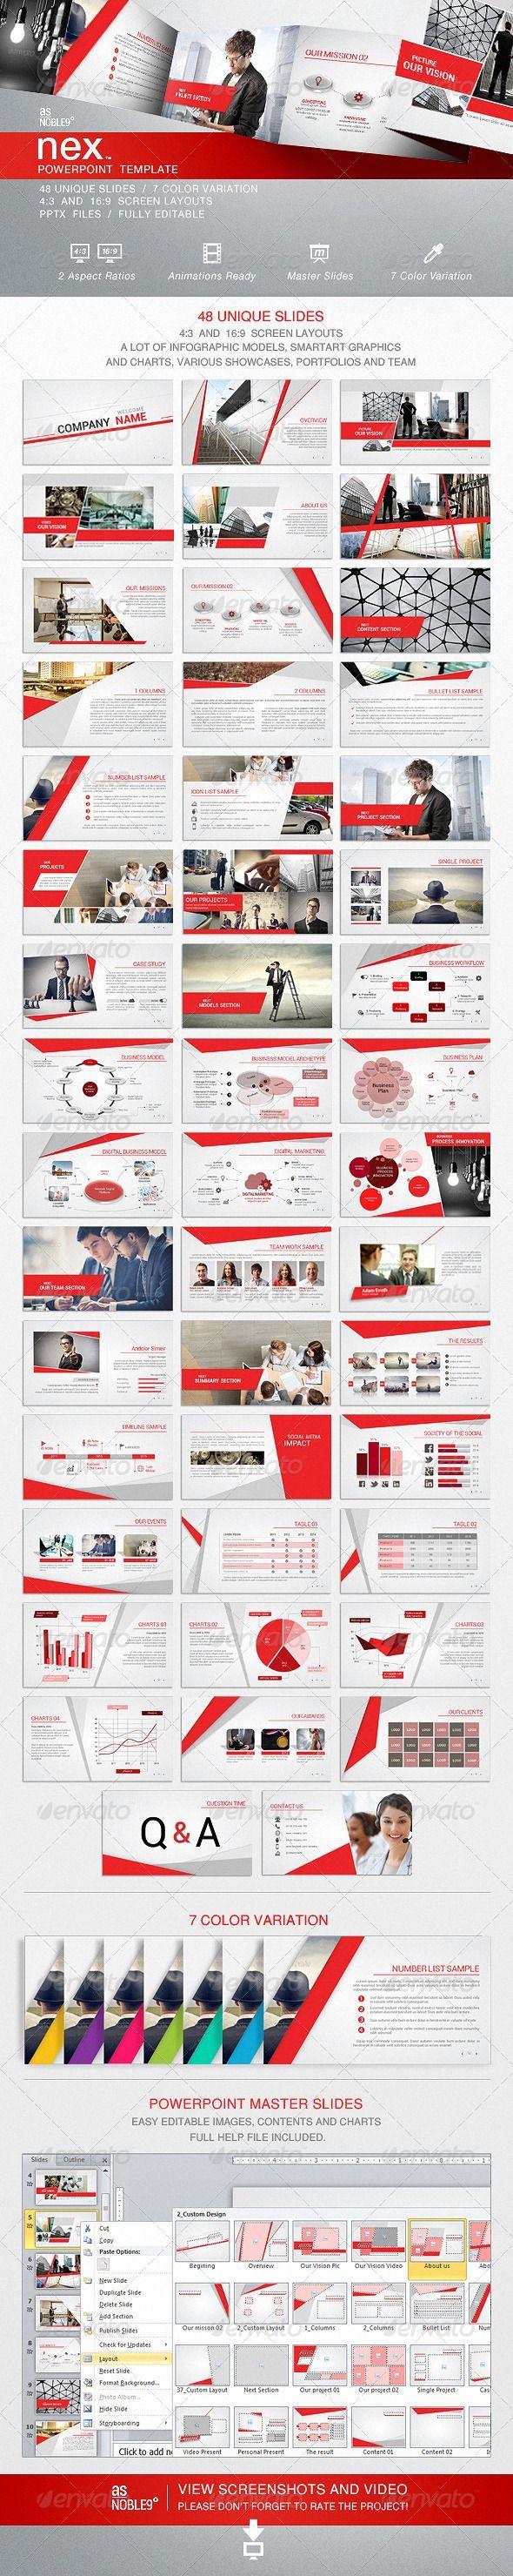 NEX - PowerPoint Template - Business Powerpoint Templates #infographics